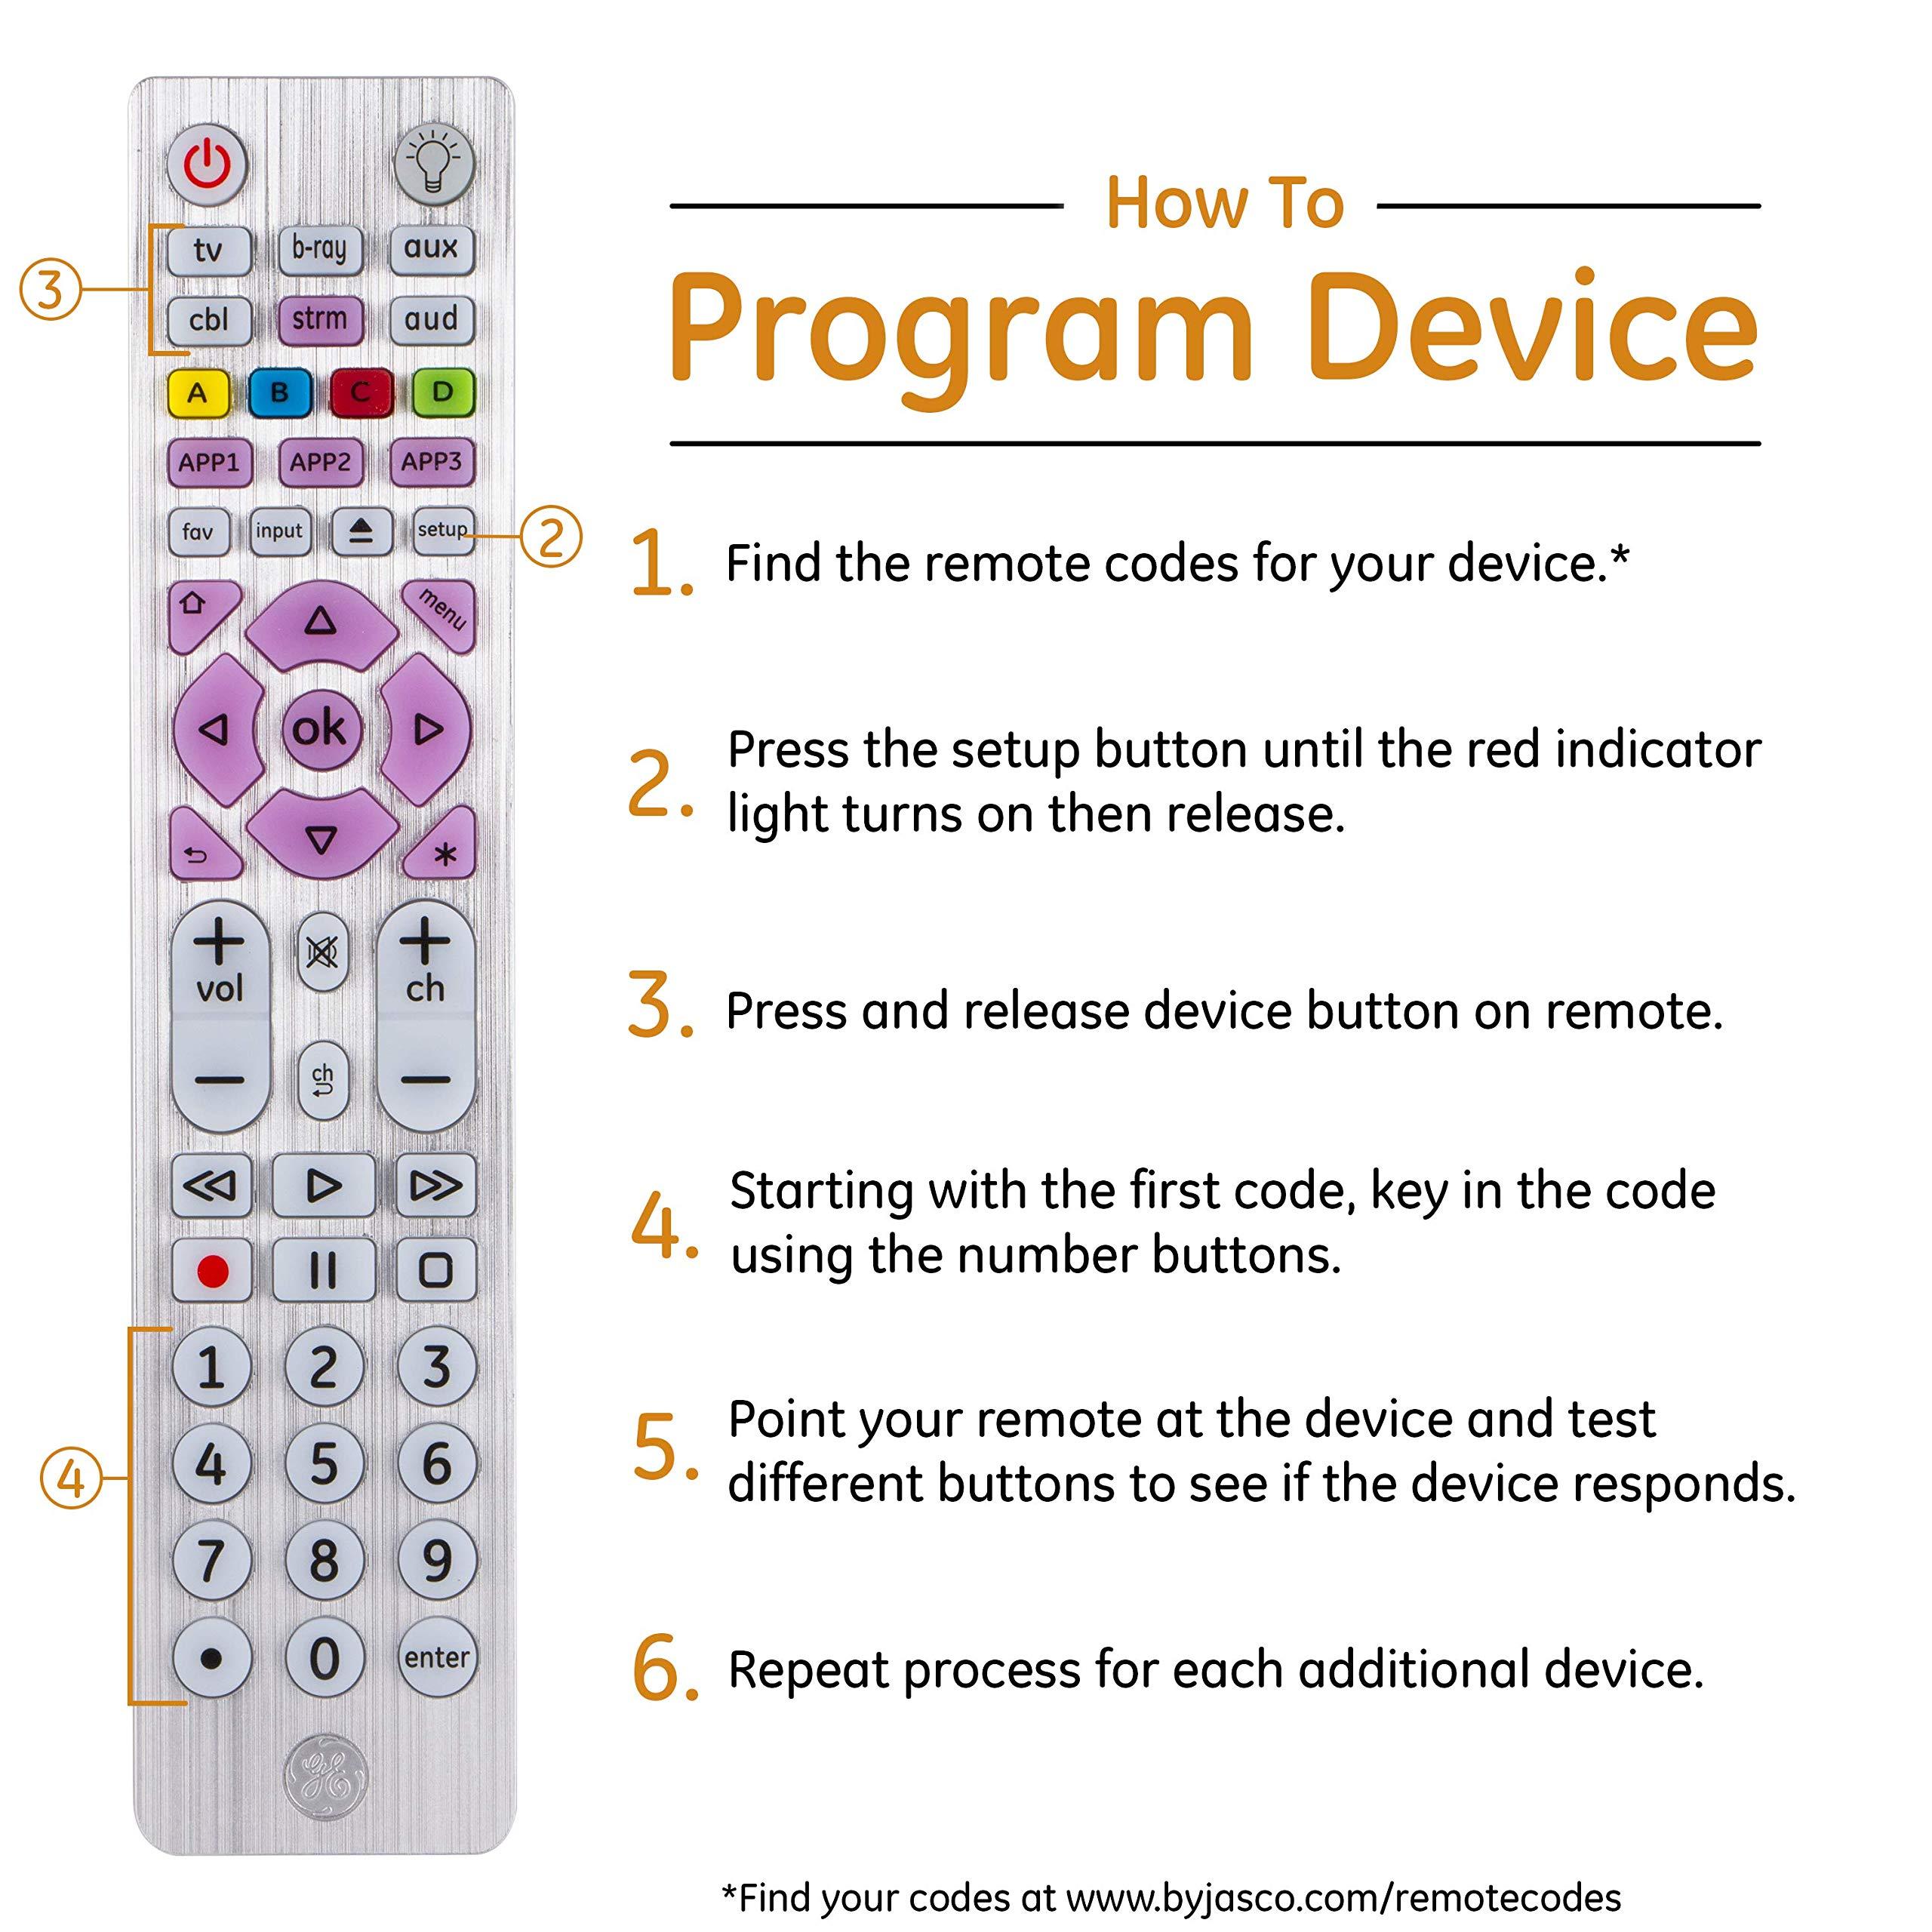 Blu-Ray Lg Smart TVs DVD Streaming Players 37038 Sharp 6-Device Vizio Master Volume Control Silver Sony Roku Apple TV GE Backlit Universal Remote Control for Samsung